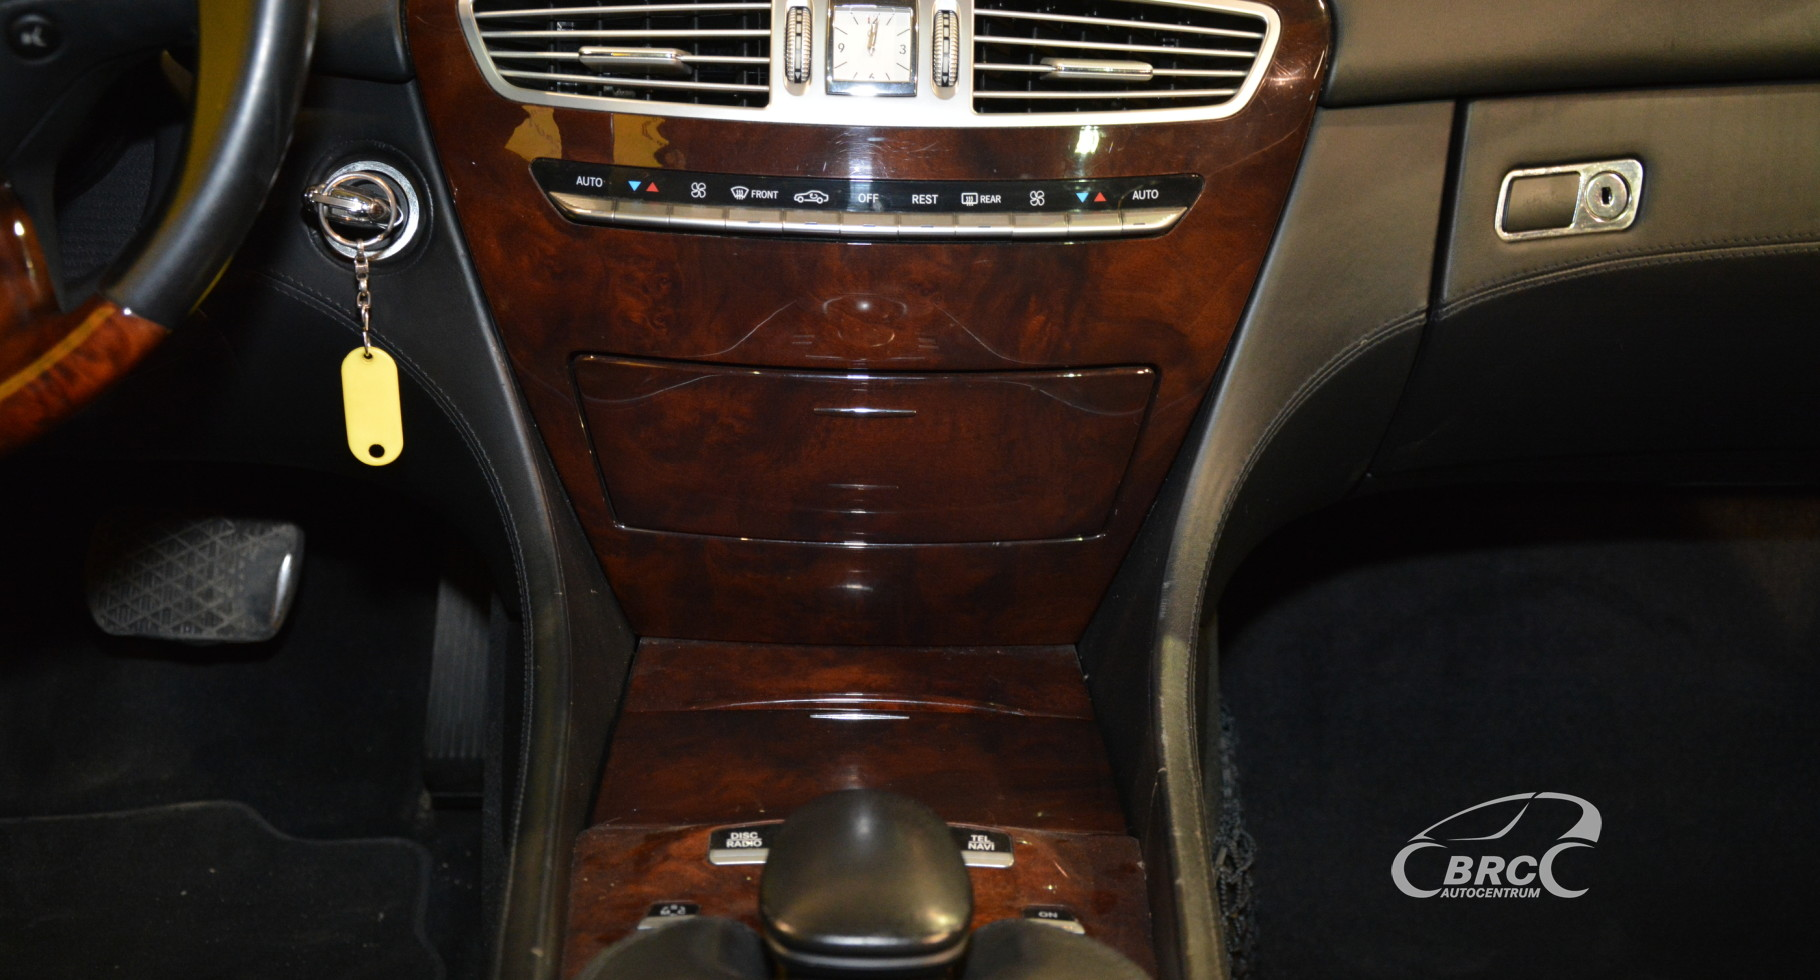 Mercedes-Benz CL 500 Automatas